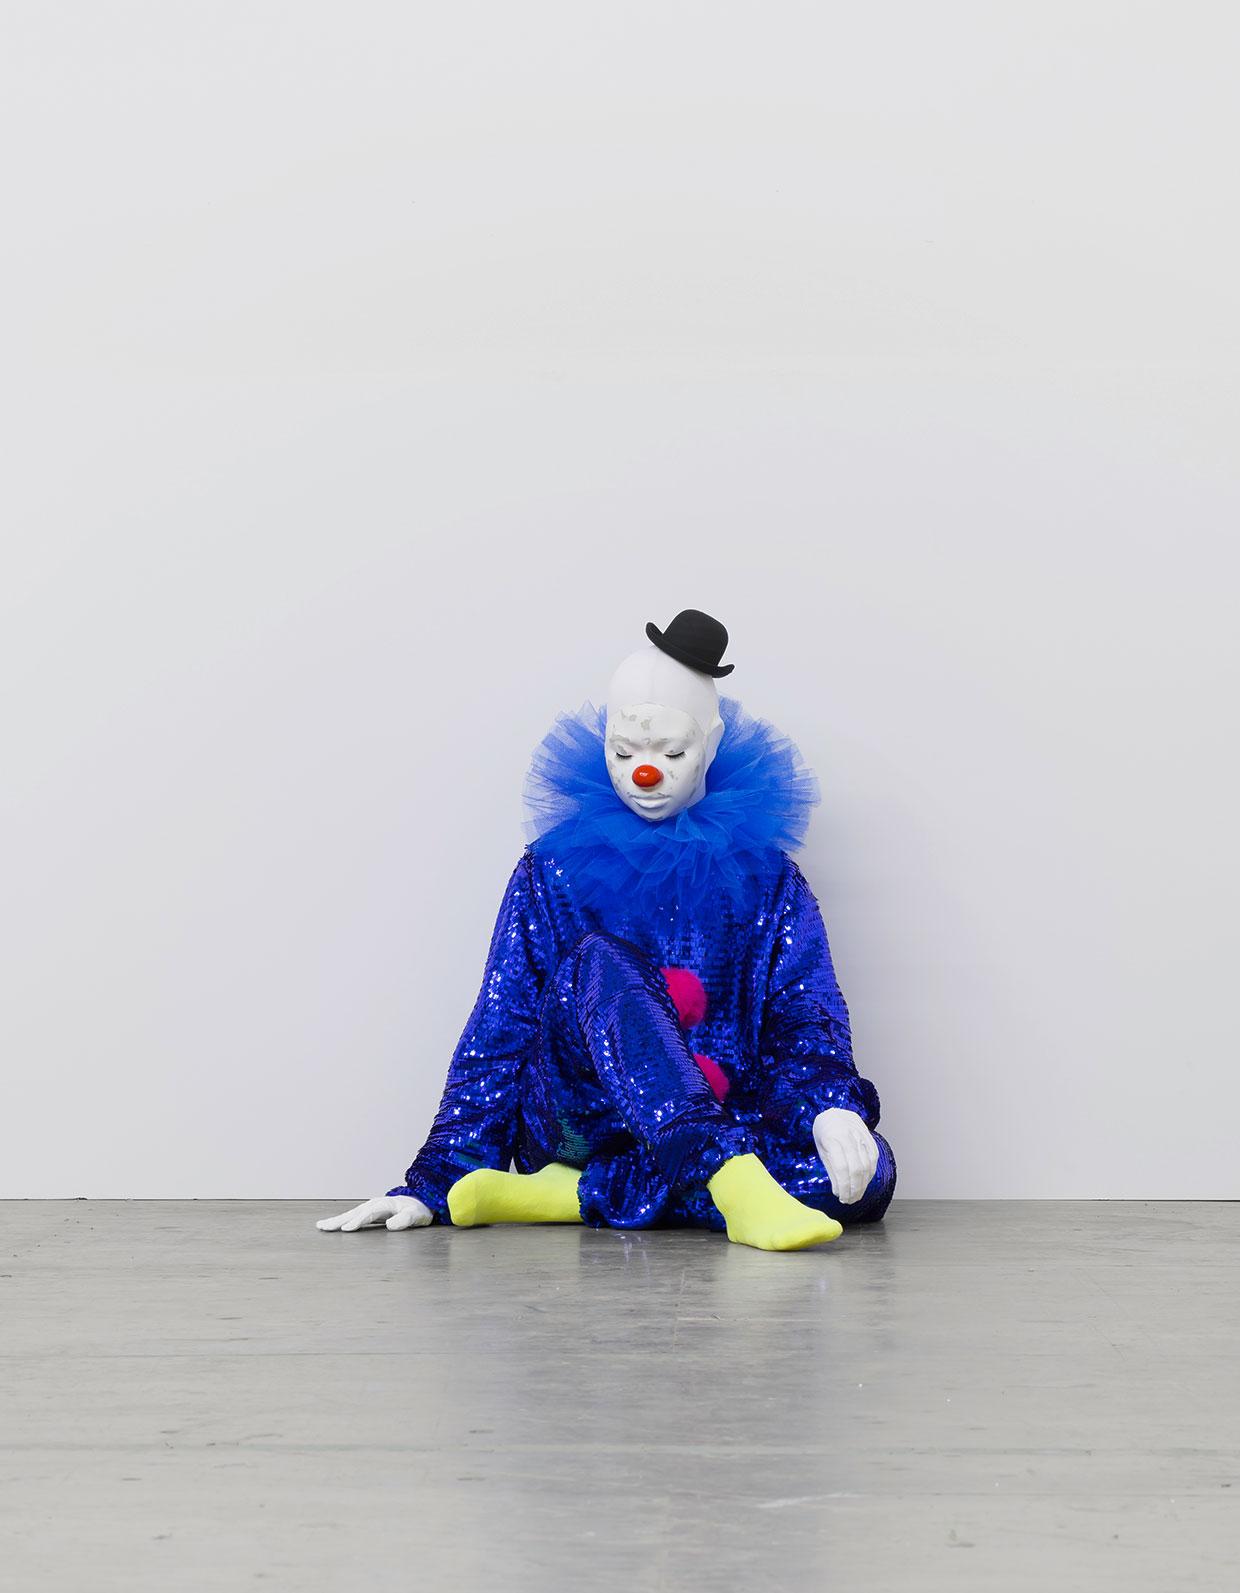 Ugo Rondinone, vocabulary of solitude, 2014-2016. Curtesy of the artist